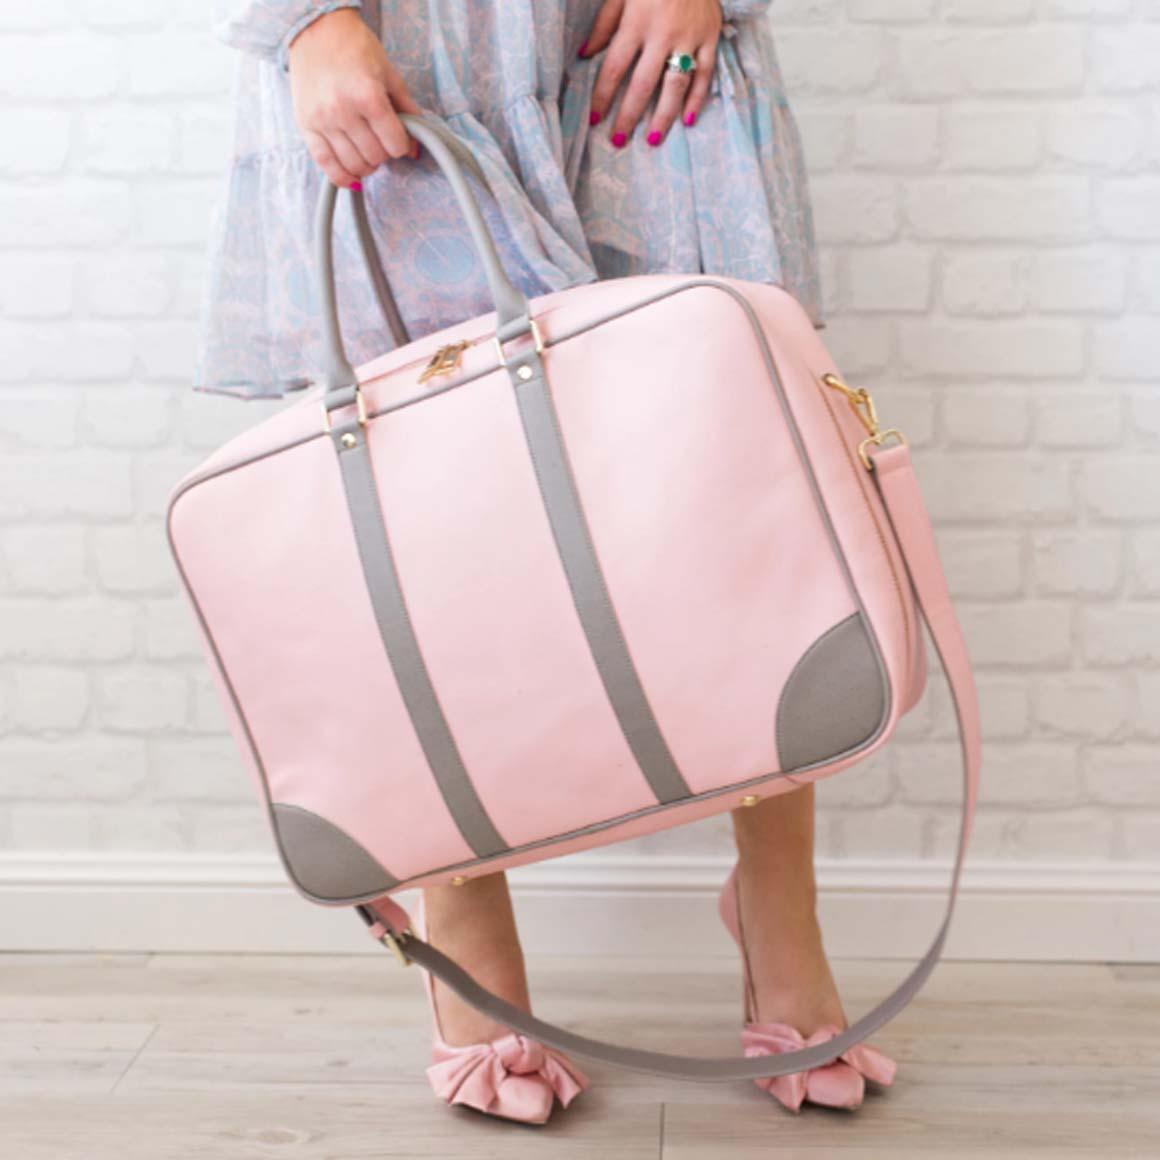 Soft-sided Case Pink | Trada Marketplace